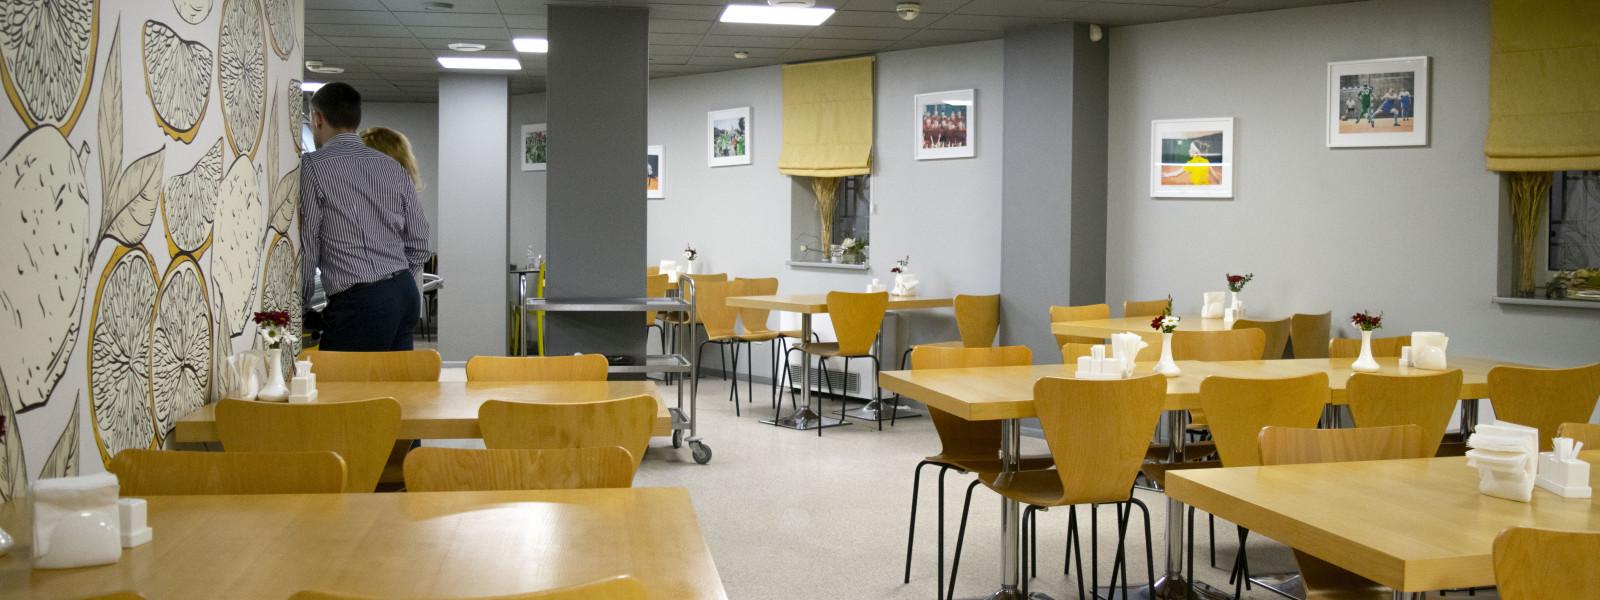 Dinner's в офісі UKRSIBBANK